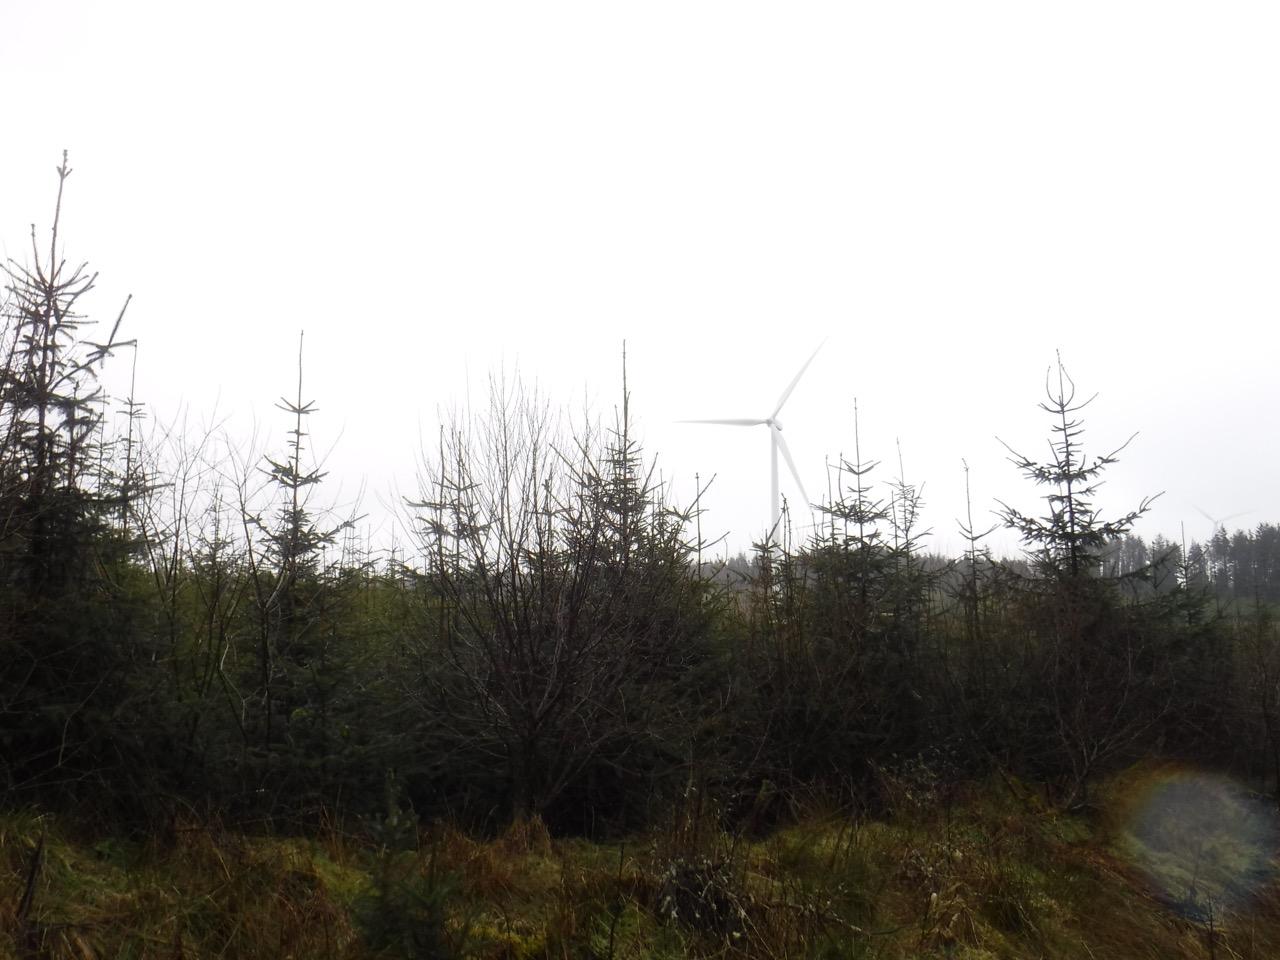 Harestanes turbine